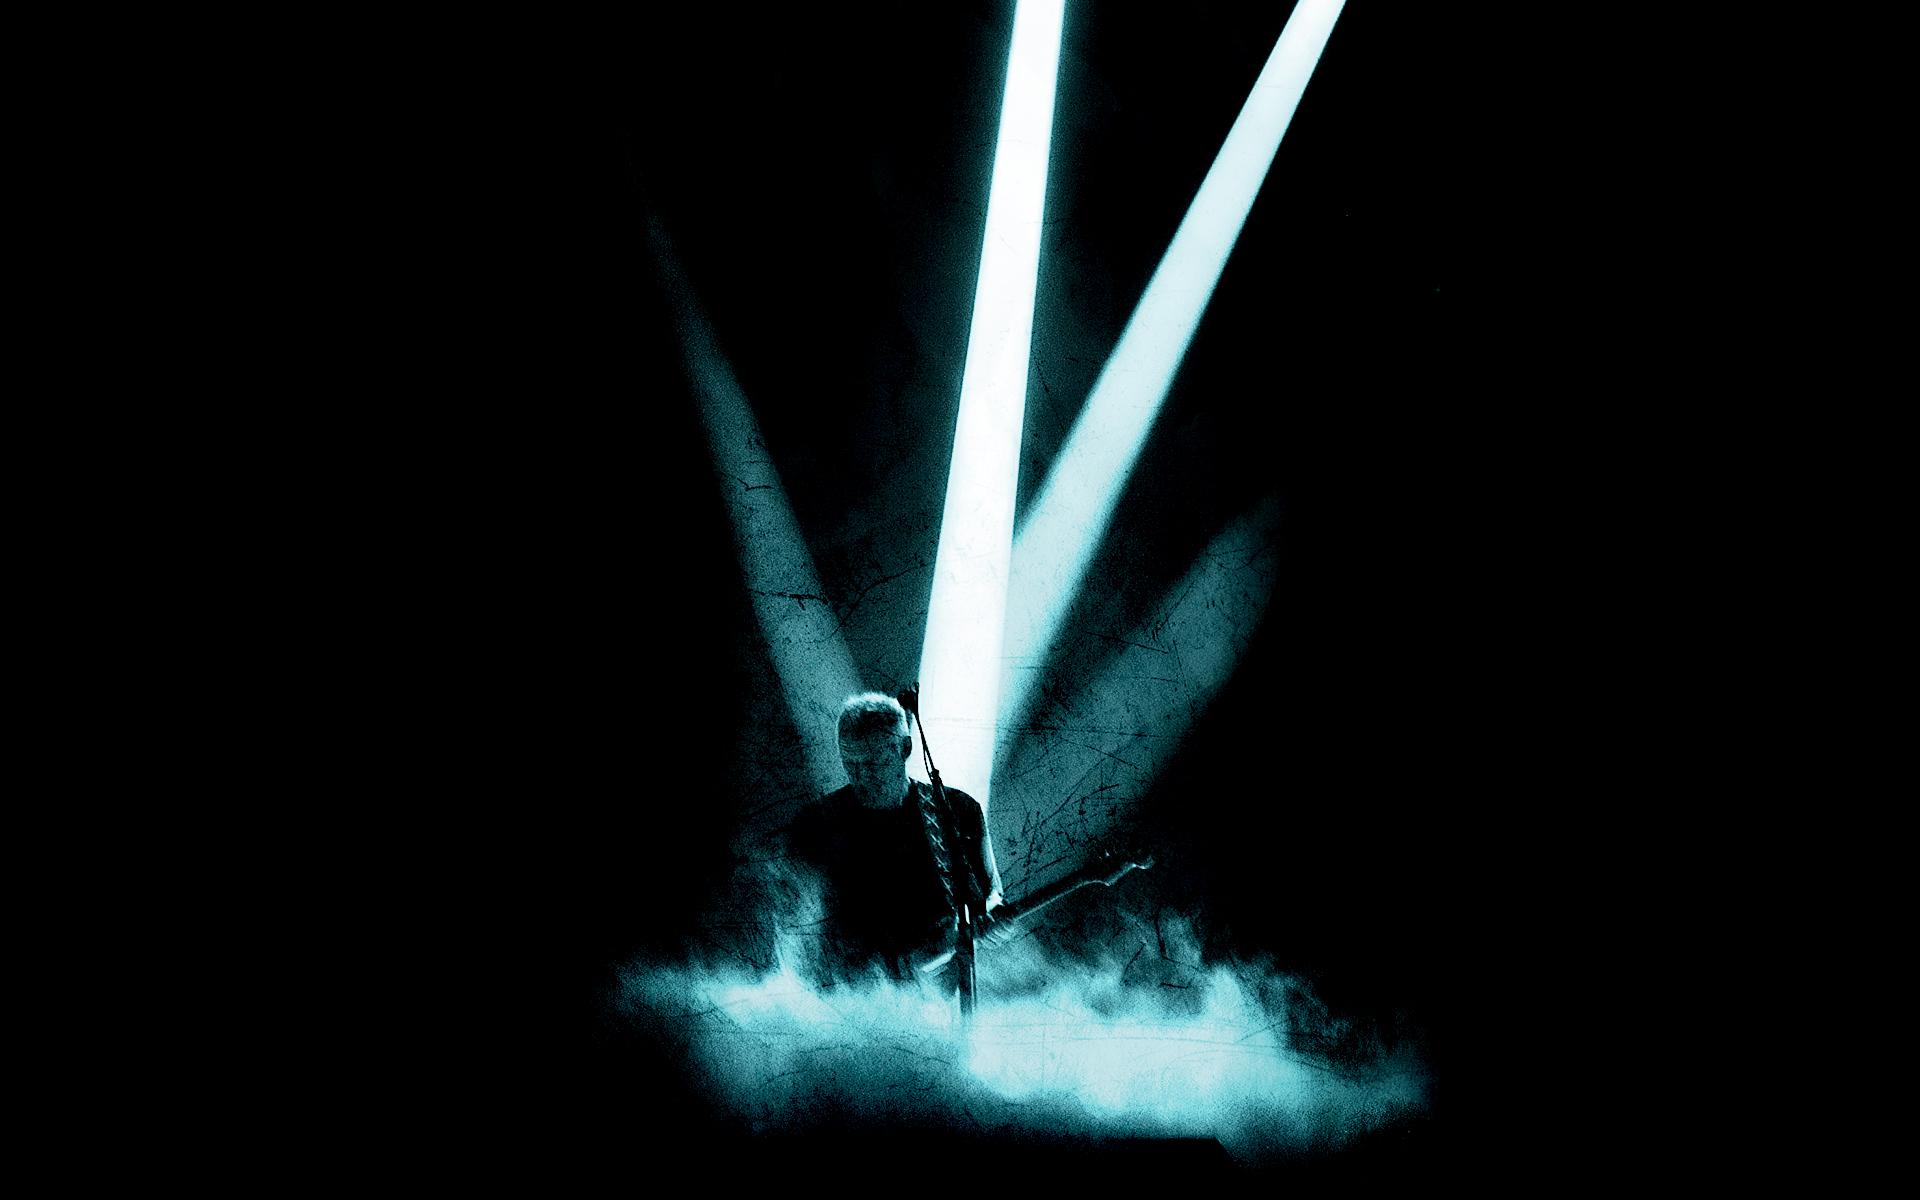 Dark Gilmour by HeskinRadiophonic